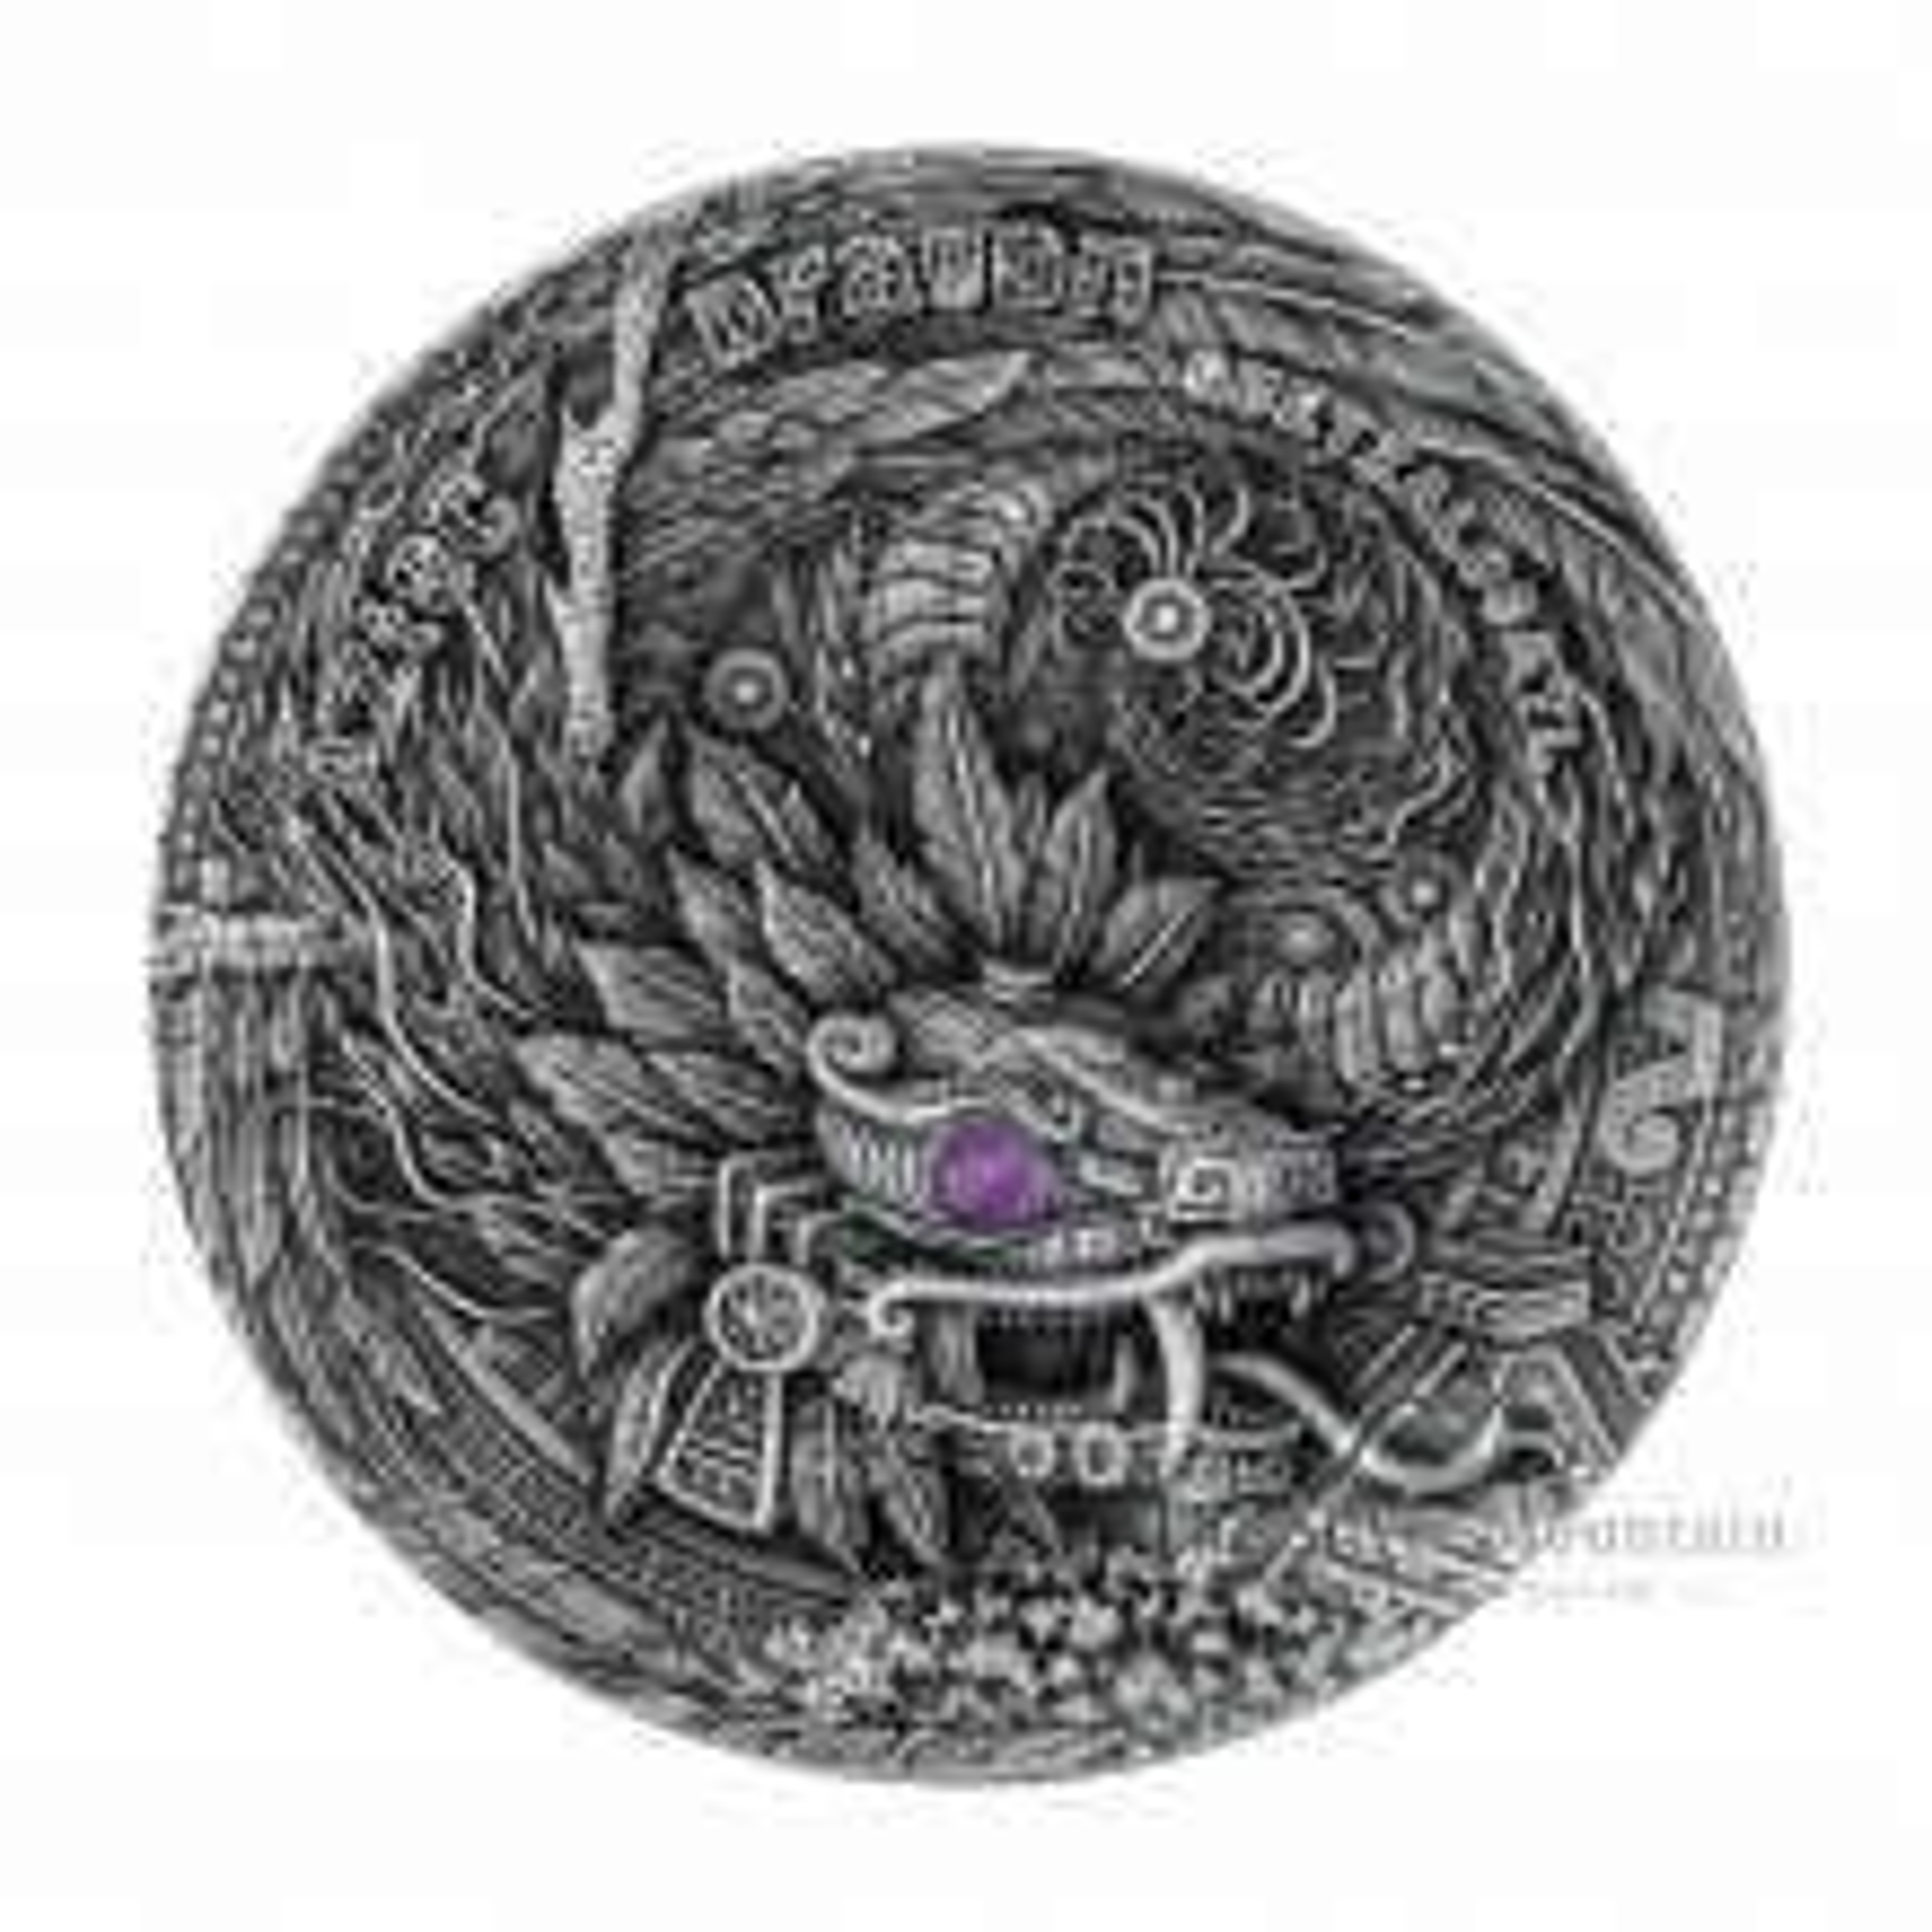 2 troy ounce silver coin Aztec Dragon 2021